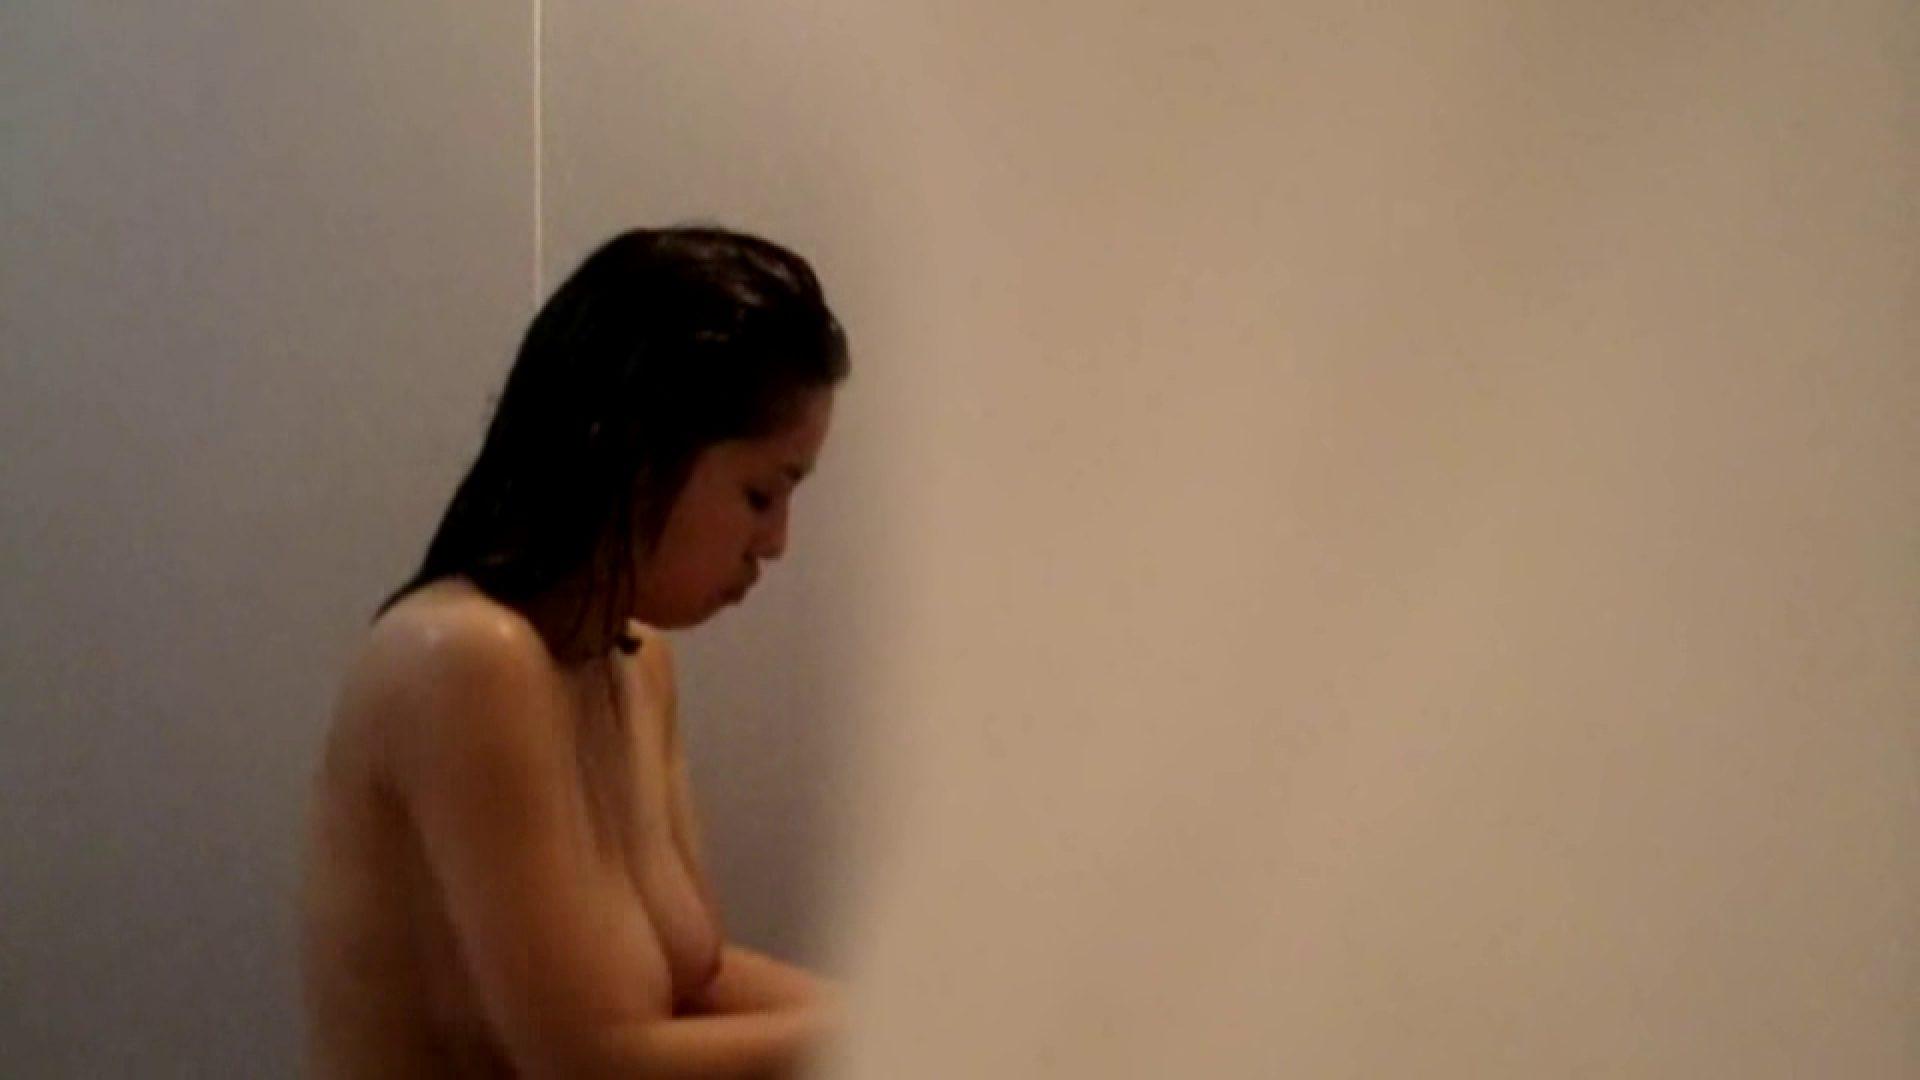 vol.2 葵のグラドル顔負けの爆乳を入浴シーンでどうぞ。 入浴中の女性 盗み撮り動画キャプチャ 64PIX 46